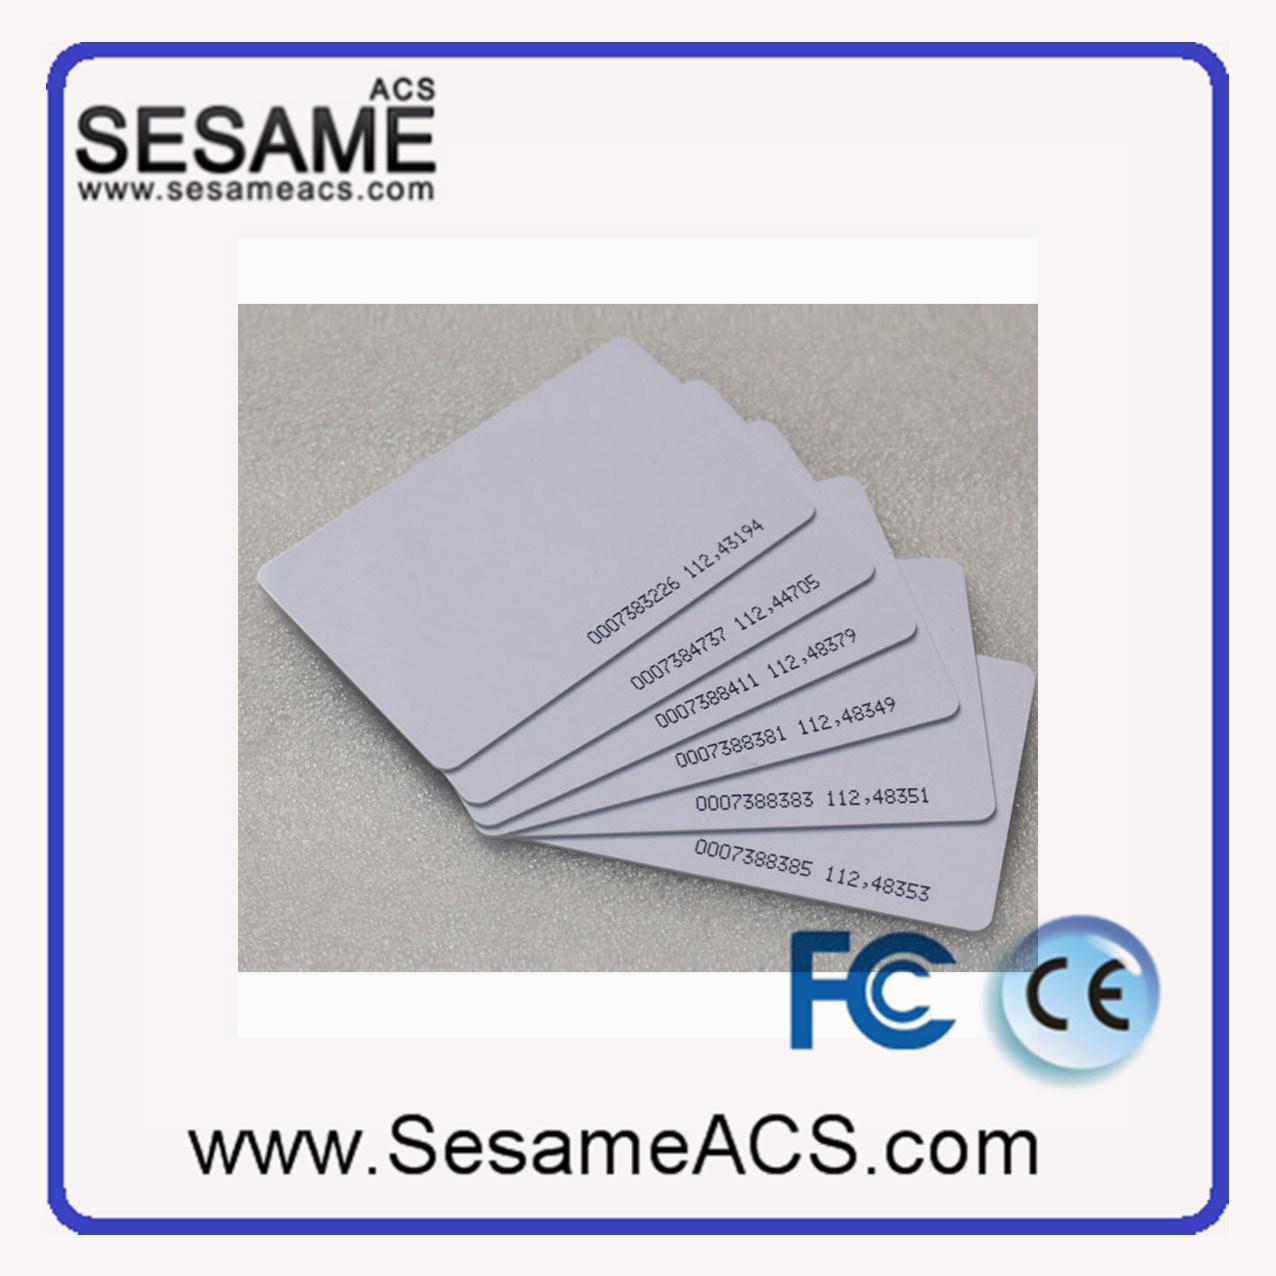 Low-Cost 125kHz RFID Em Card/125kHz Chip Card (SD5)